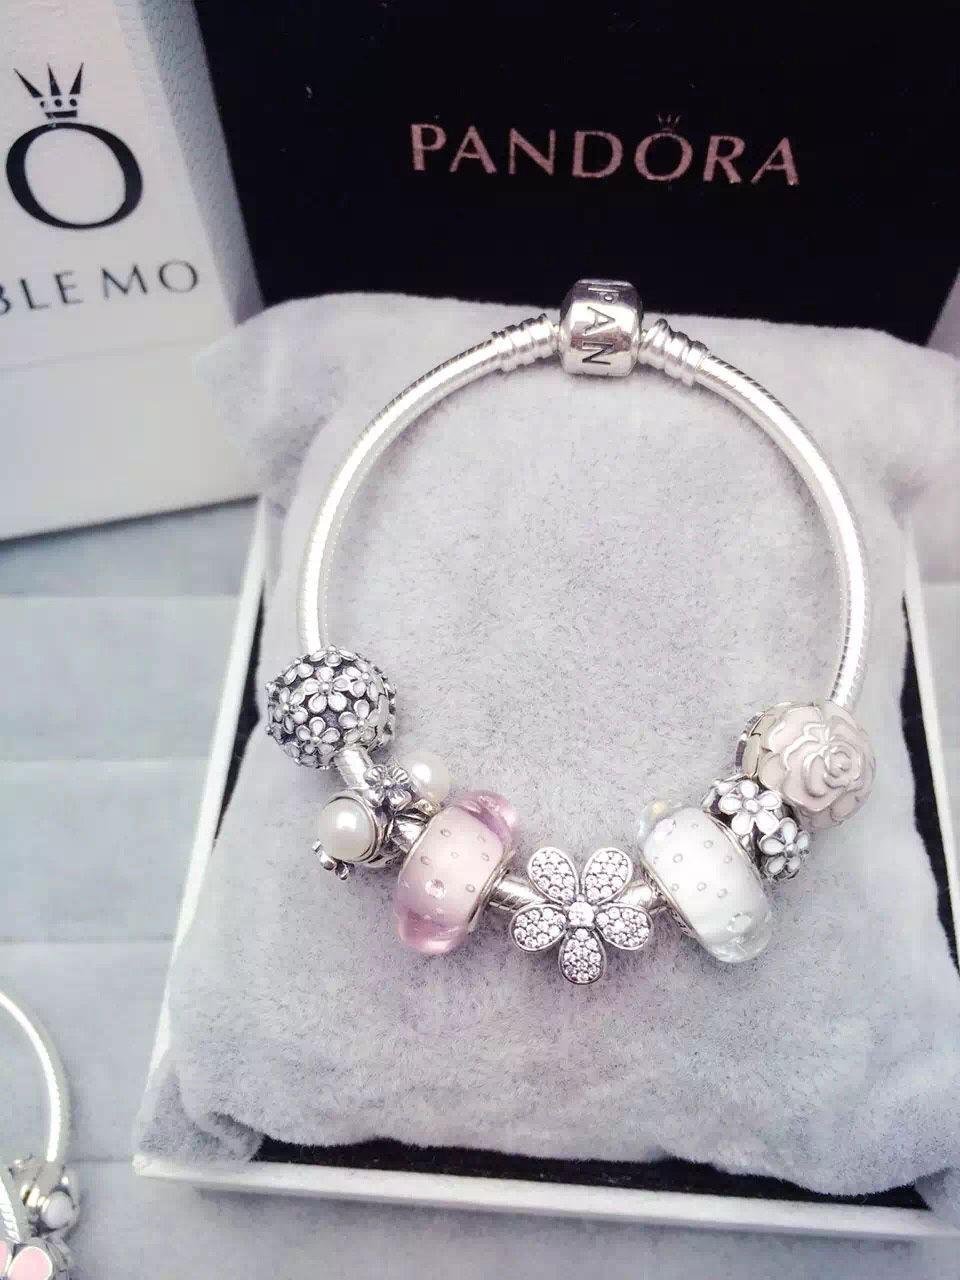 cb93c5b1c Pandora Charm Bracelet White Pink. Hot Sale!!! SKU: CB01583 - PANDORA  Bracelet Ideas